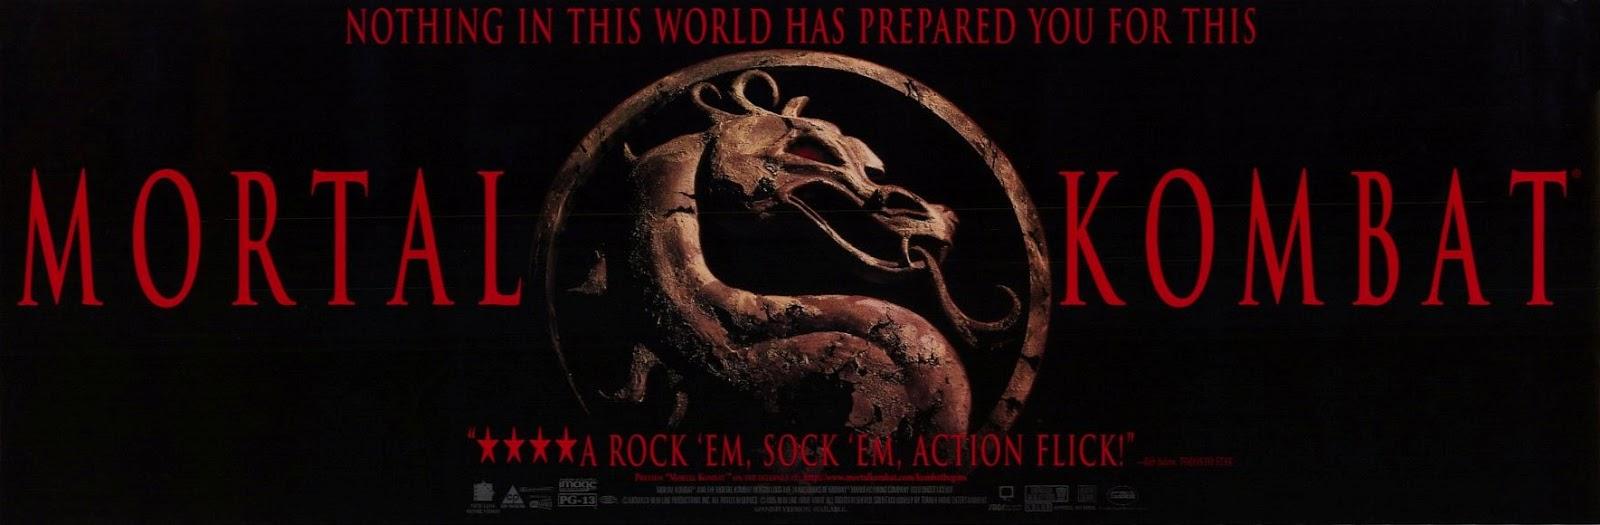 mortal kombat movie johnny cage vs scorpion